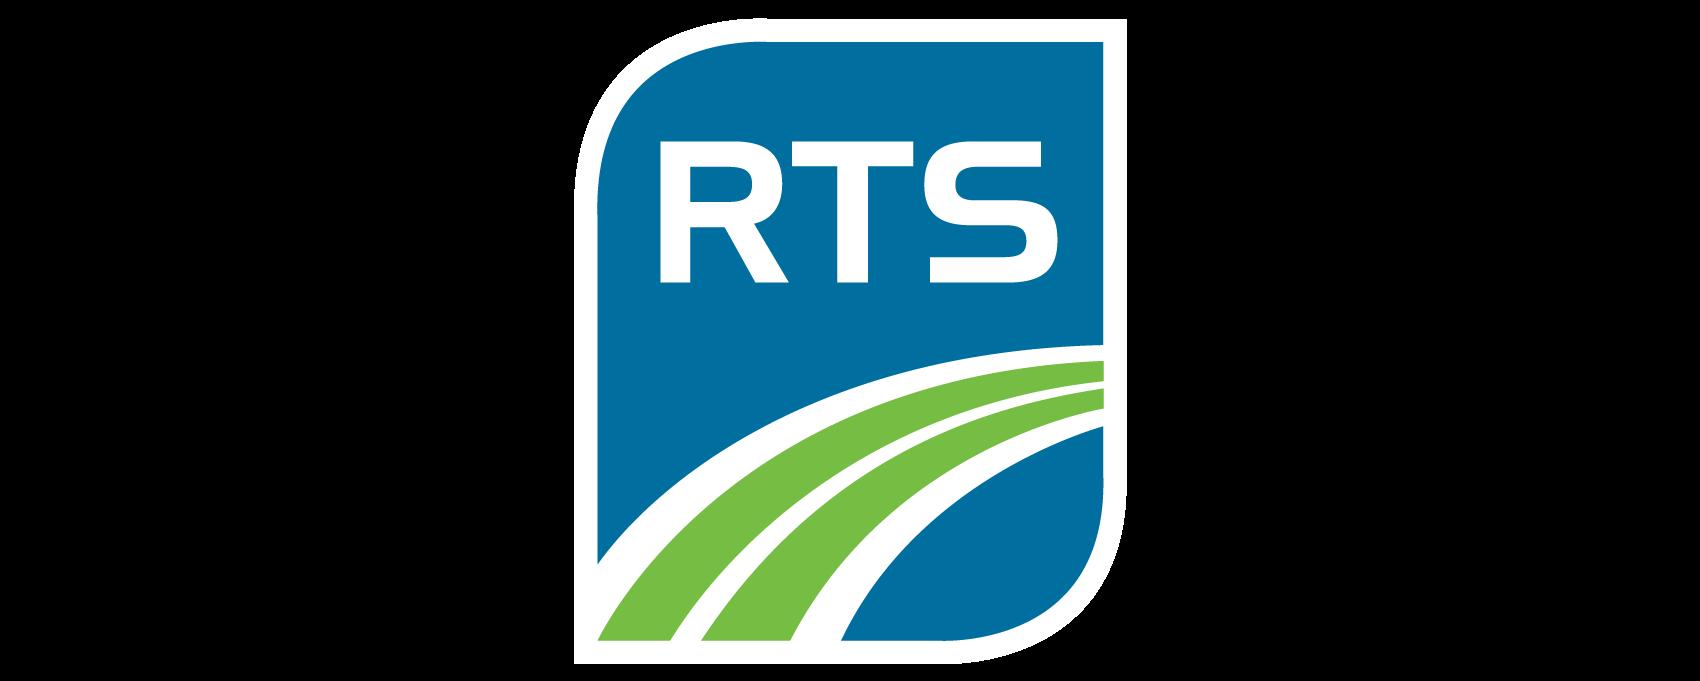 rts_2_logo